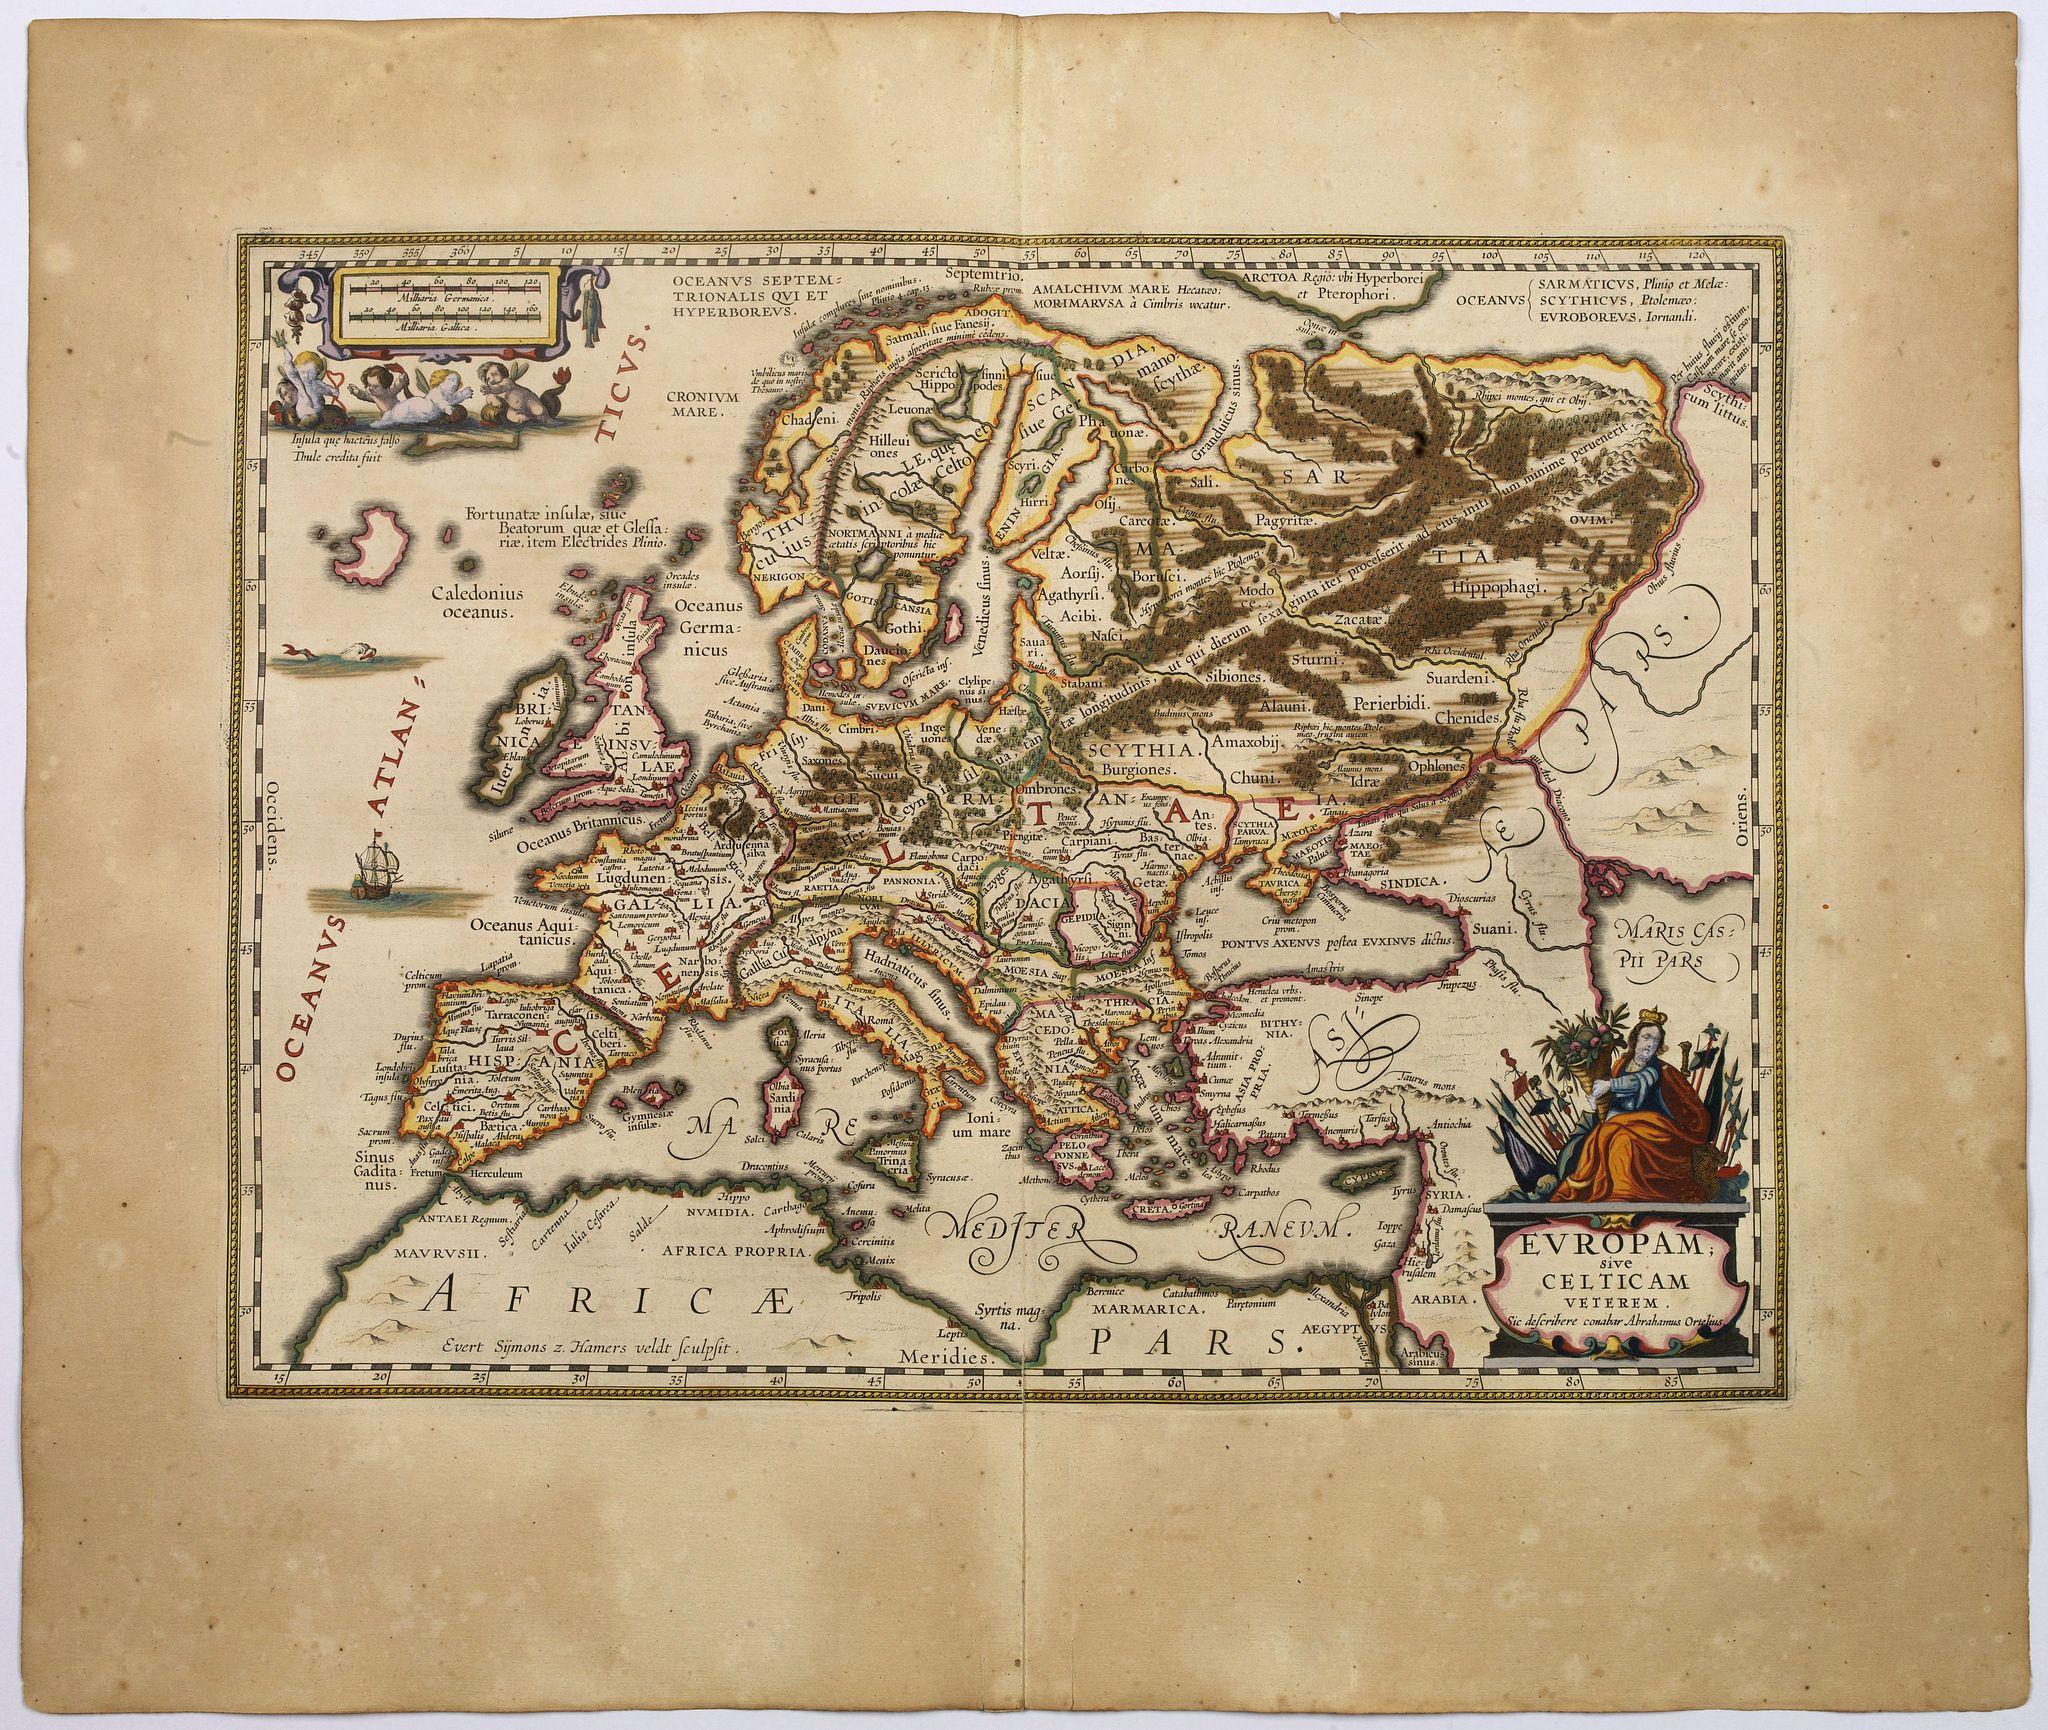 JANSSONIUS, Jan. - Europam, sive Celticam Veterem.